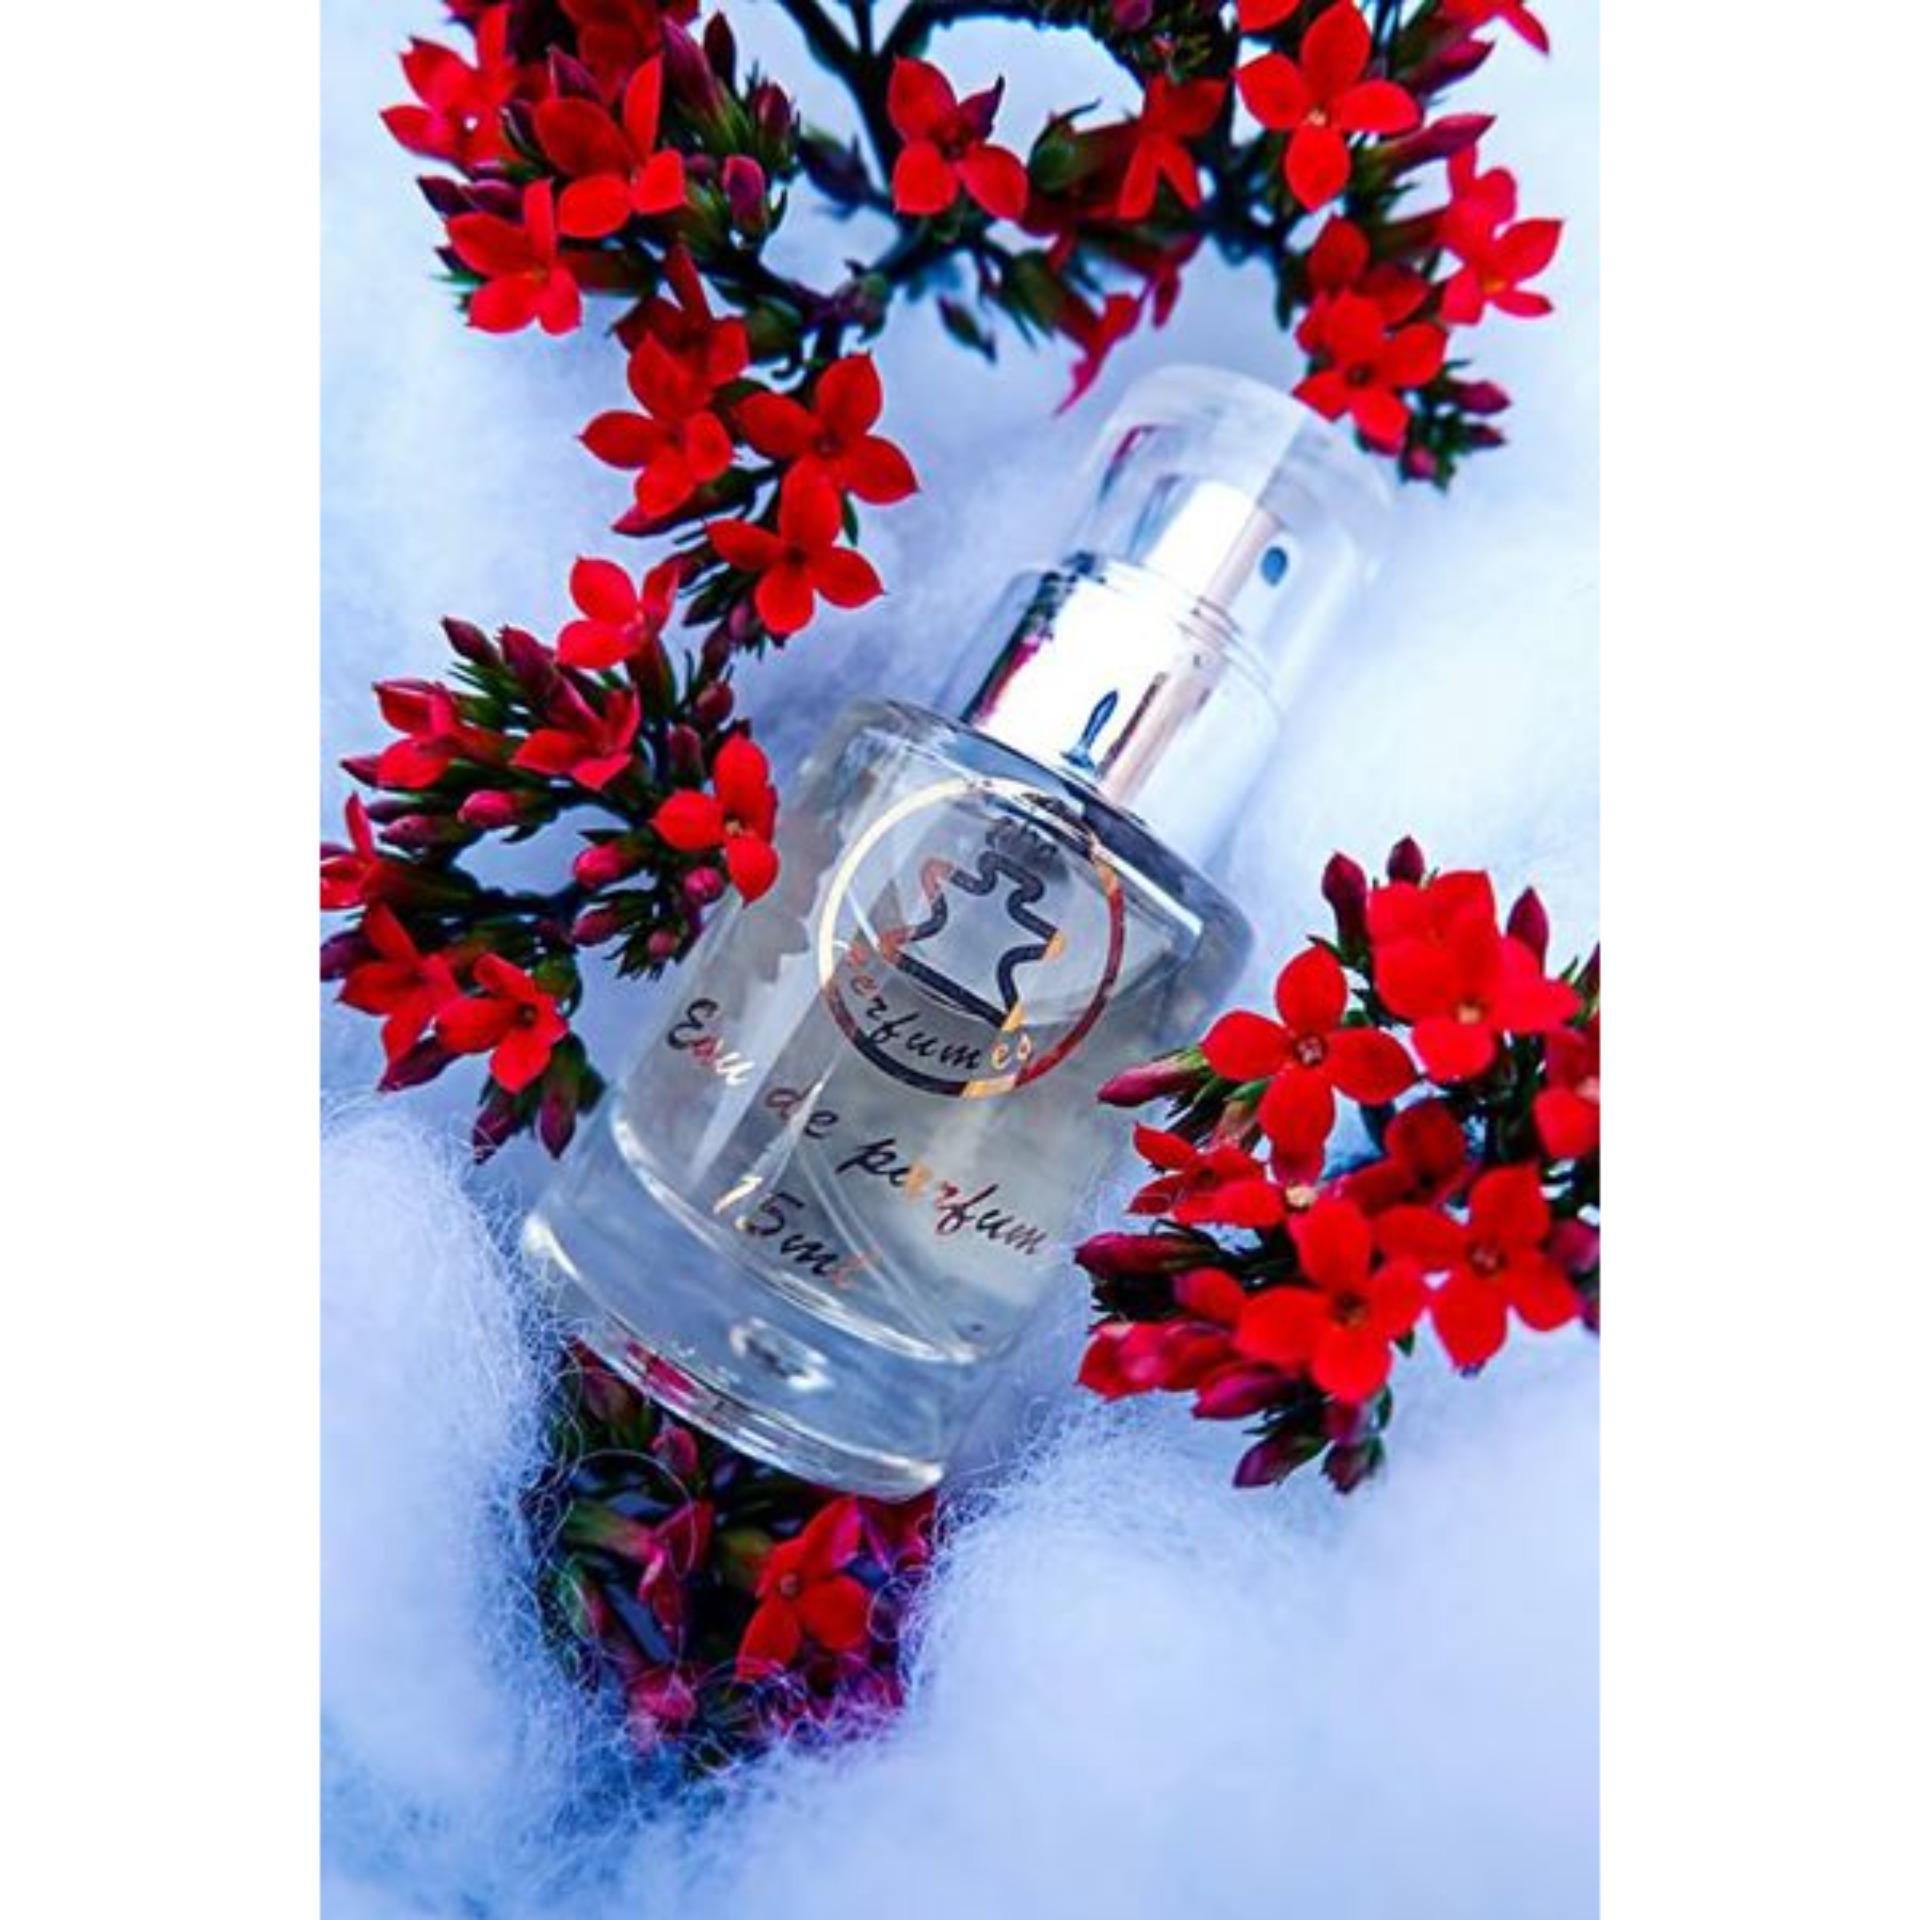 Nước hoa nữ AHAPERFUMES AHA842 Poison 15ml